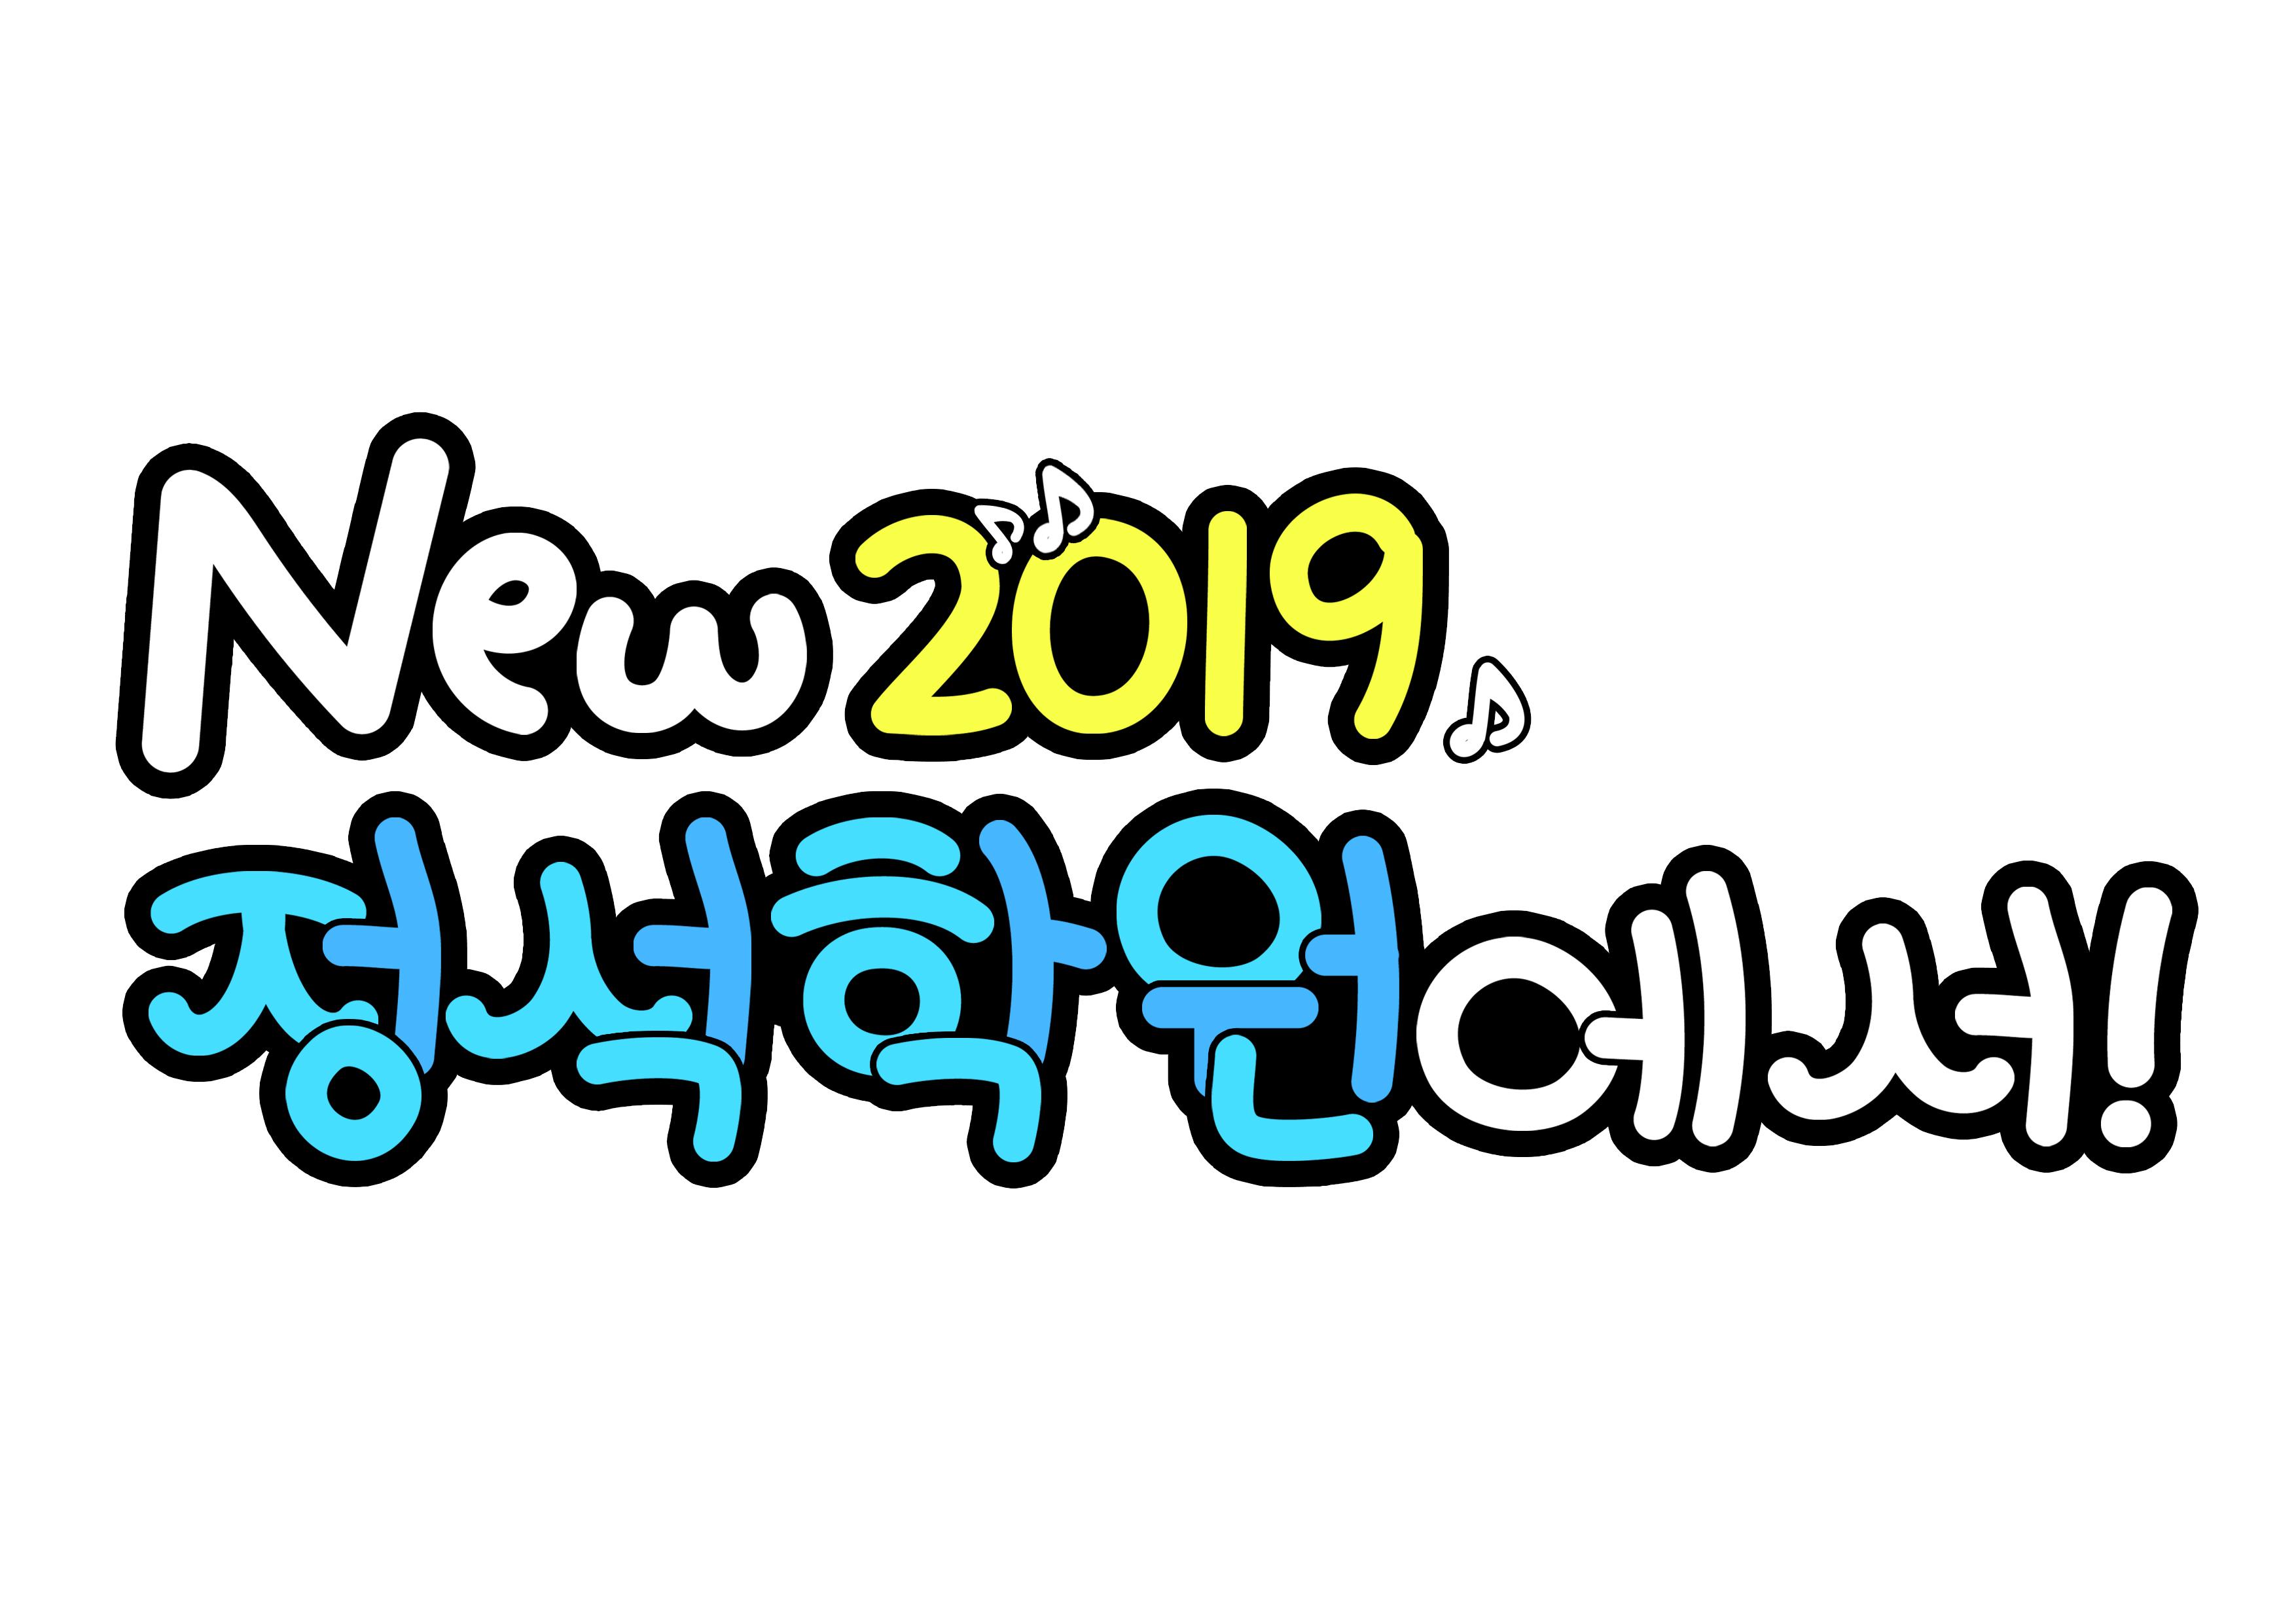 New 2019 정석학원에서!(학원, 광고)